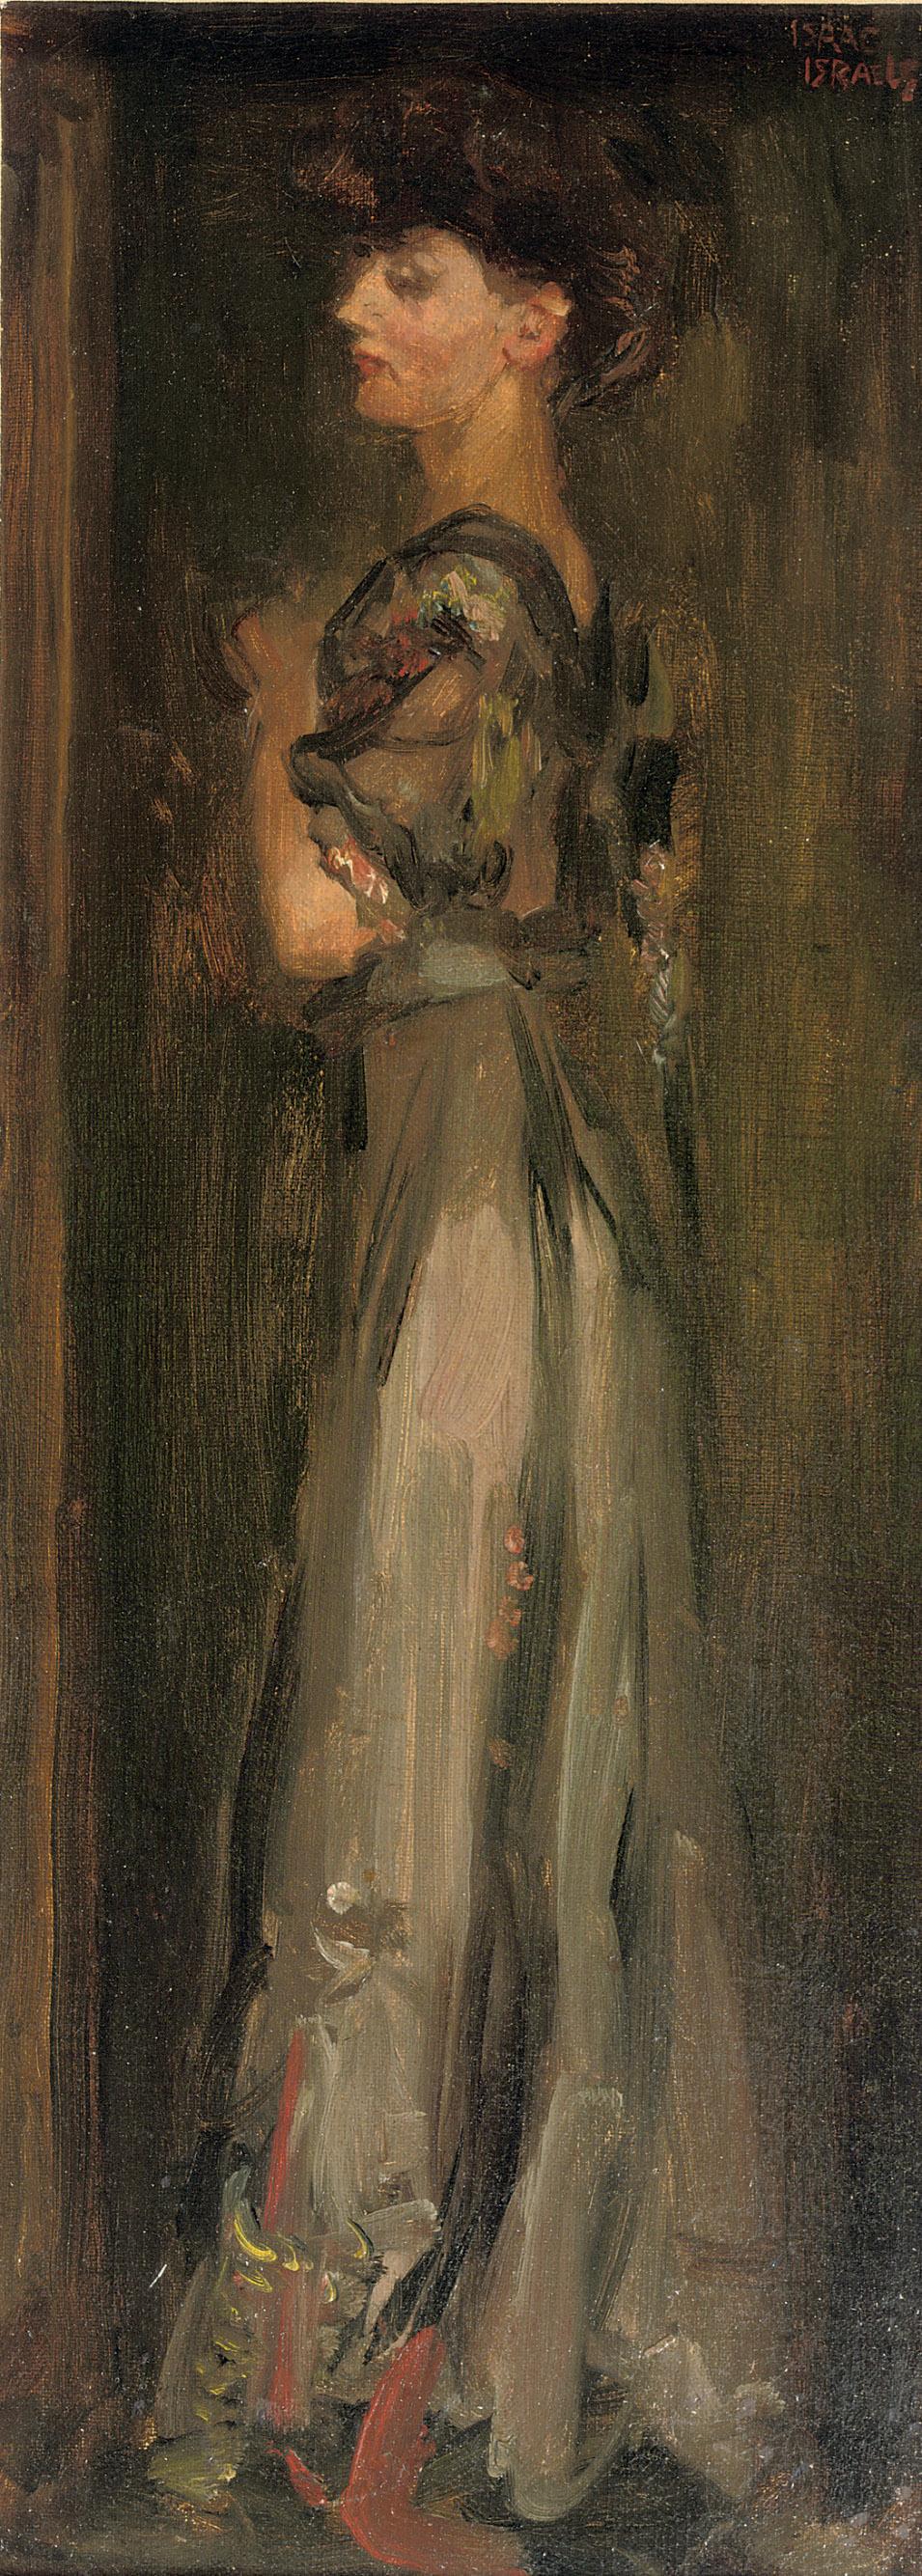 Isaac Israels (1865-1934)